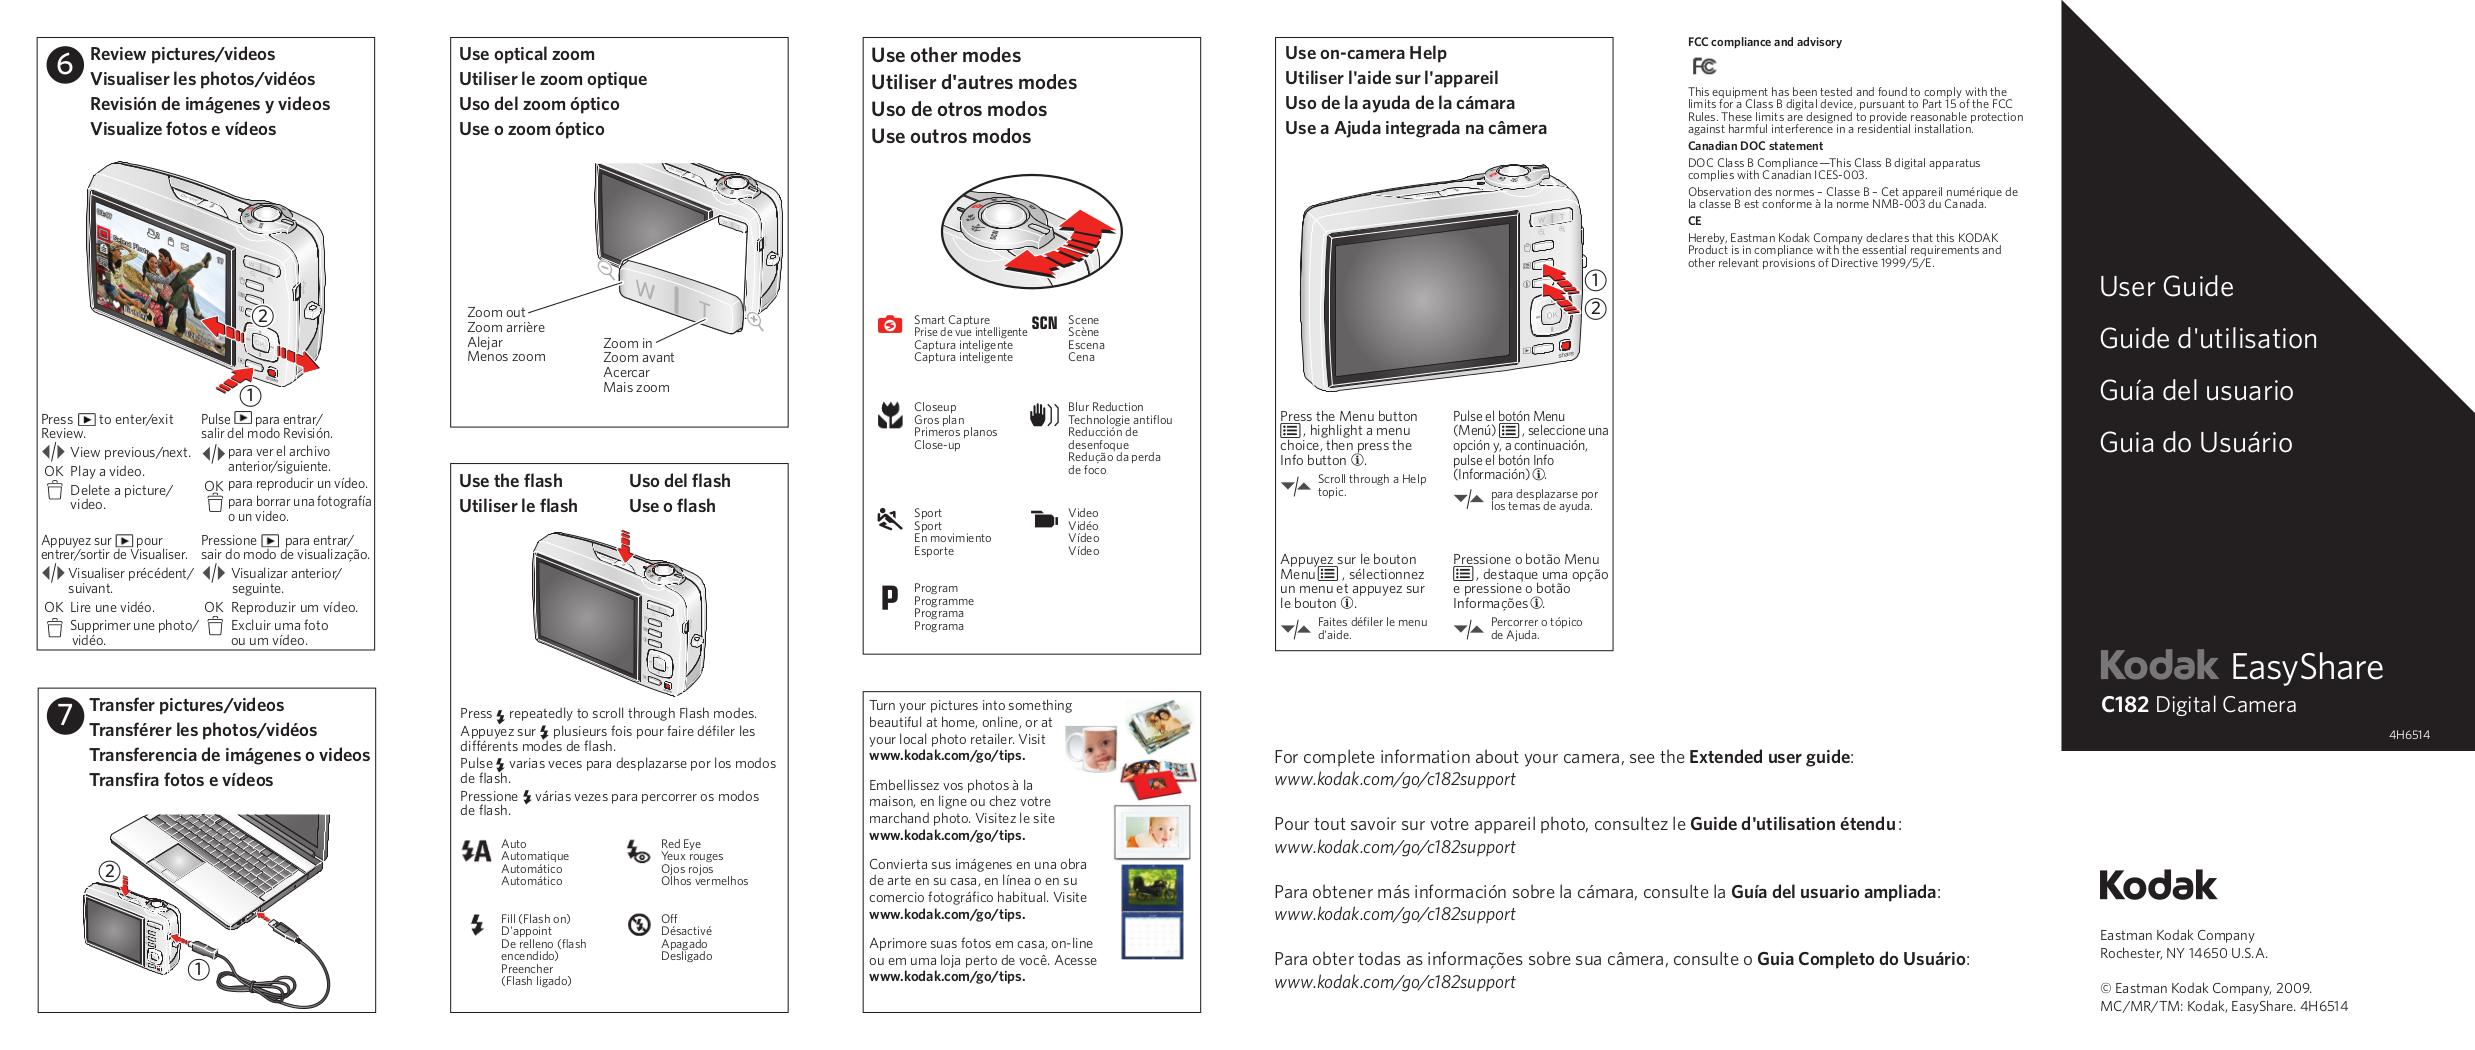 download free pdf for kodak easyshare c182 digital camera manual rh umlib com Kodak EasyShare C1450 Kodak EasyShare Camera